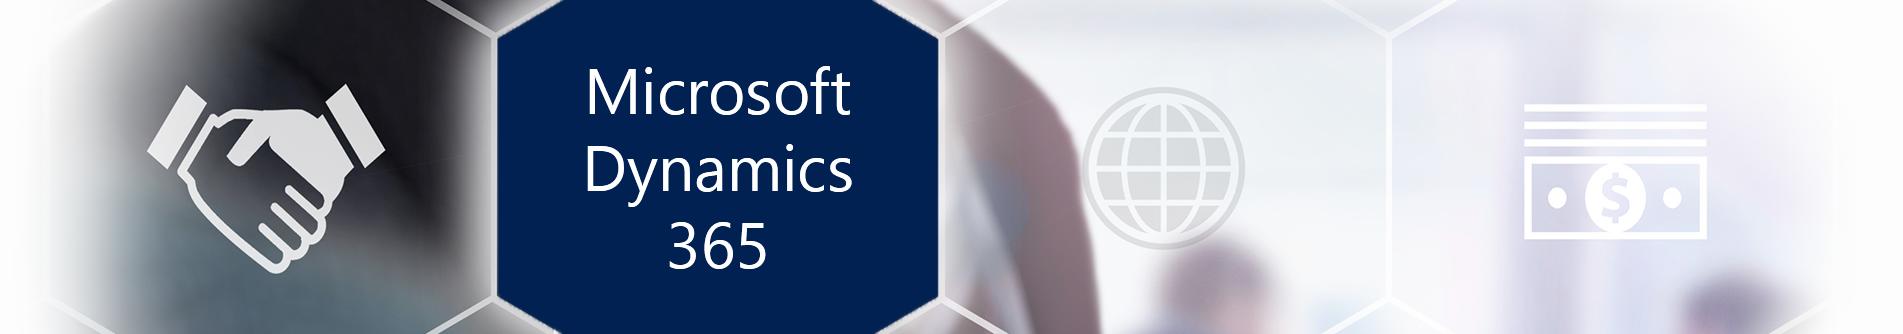 Microsoft Dynamics 365 CRM ERP cloud Provaria